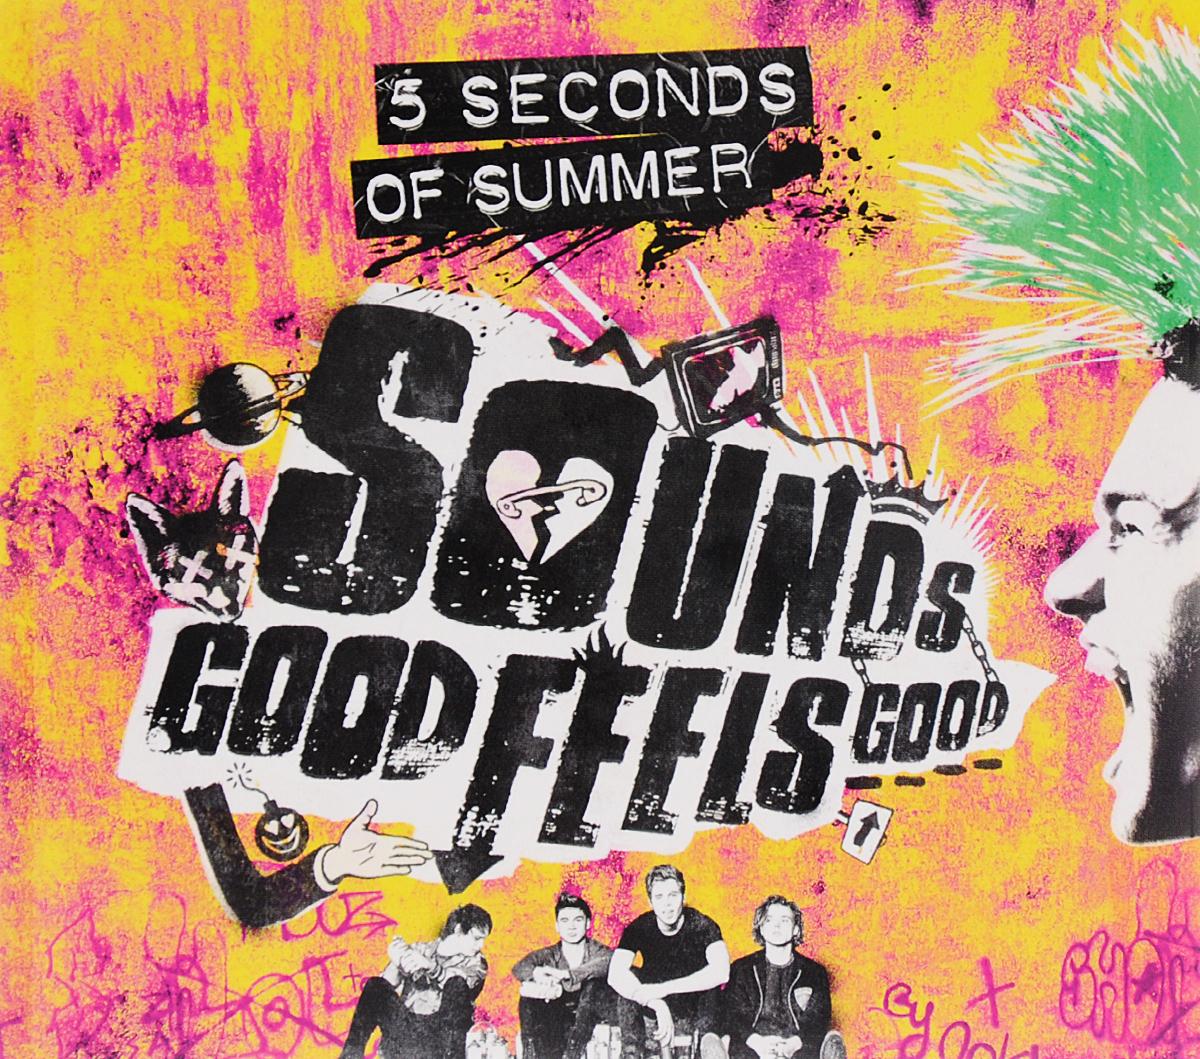 5 Seconds Of Summer 5 Seconds Of Summer. Sounds Good Feels Good 5 seconds of summer perth